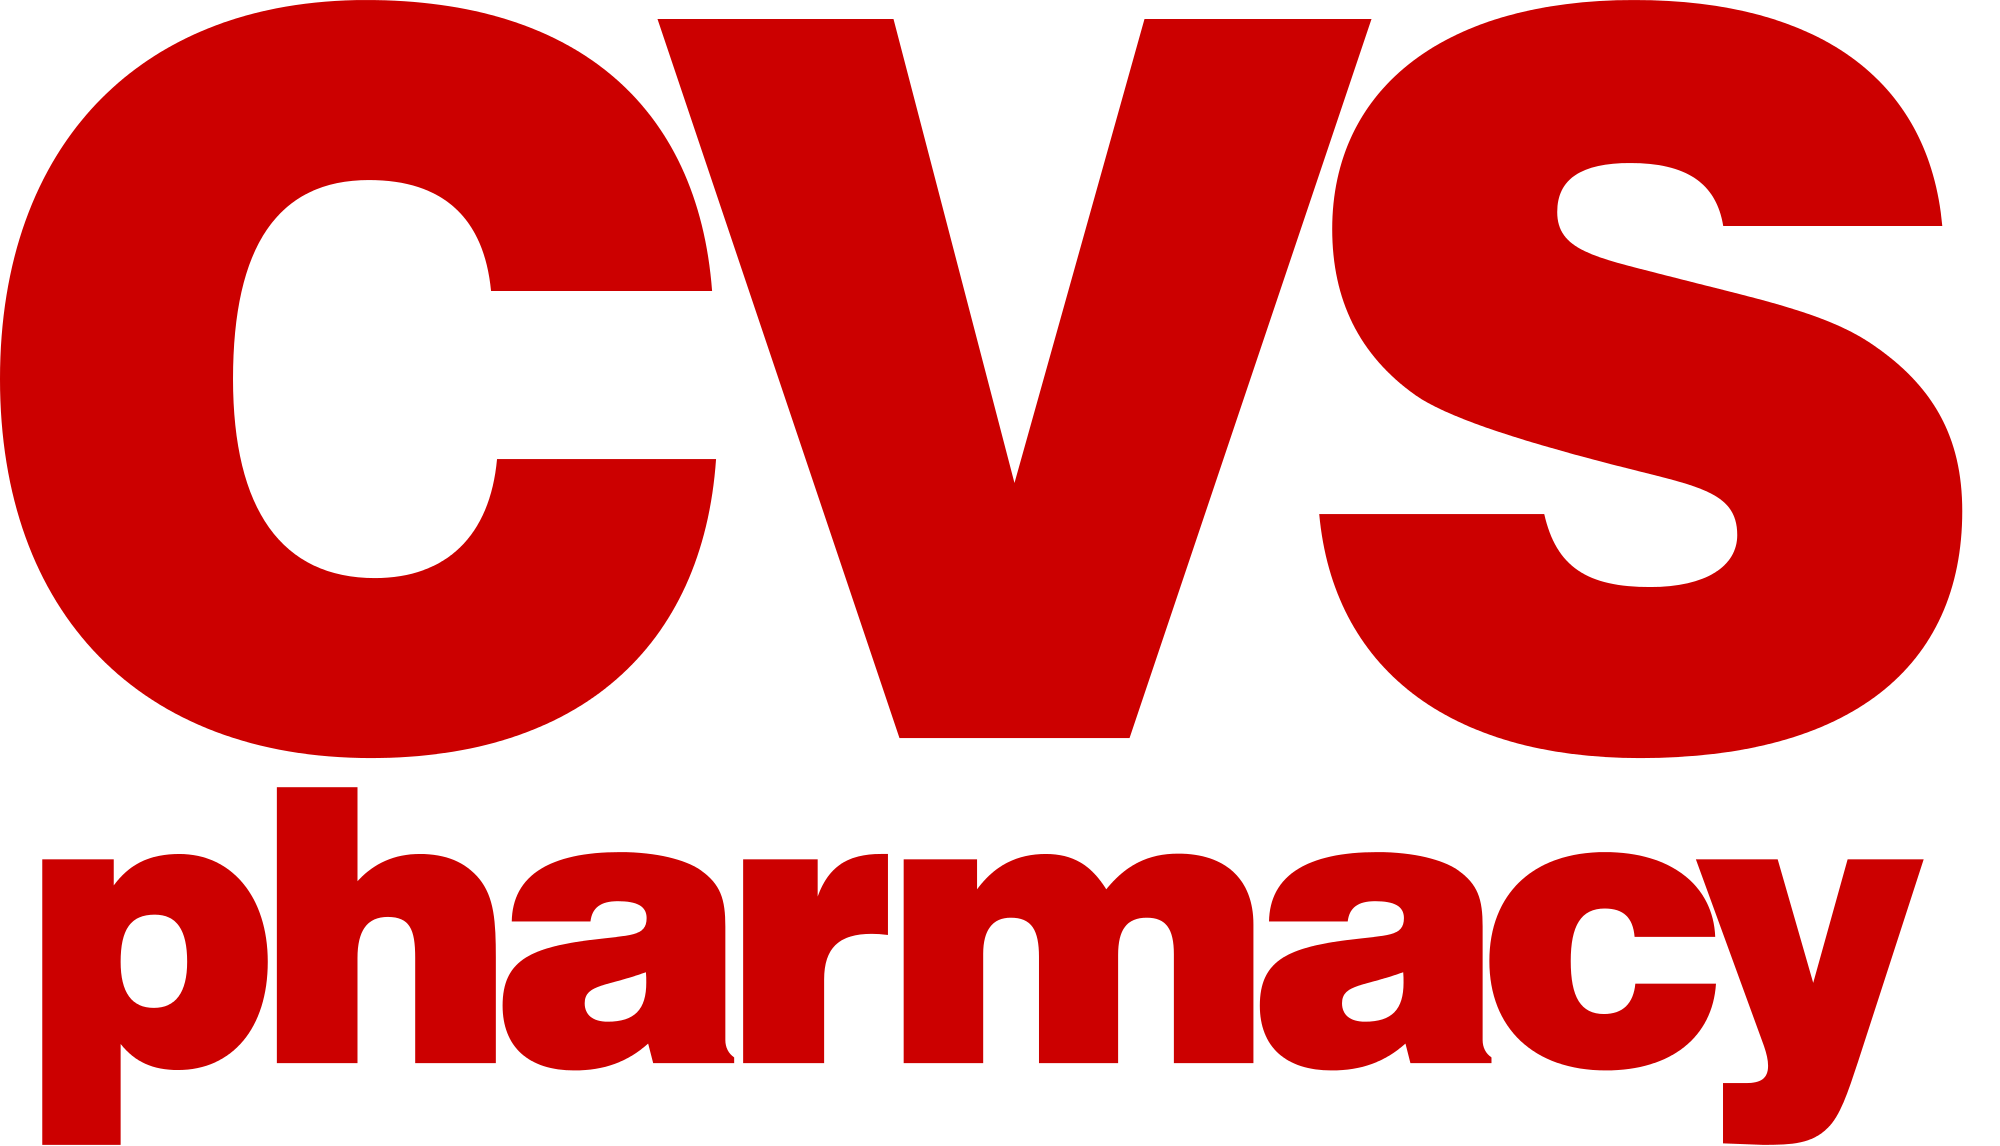 CVS Deal汇总 (10/22/17-10/28/17)